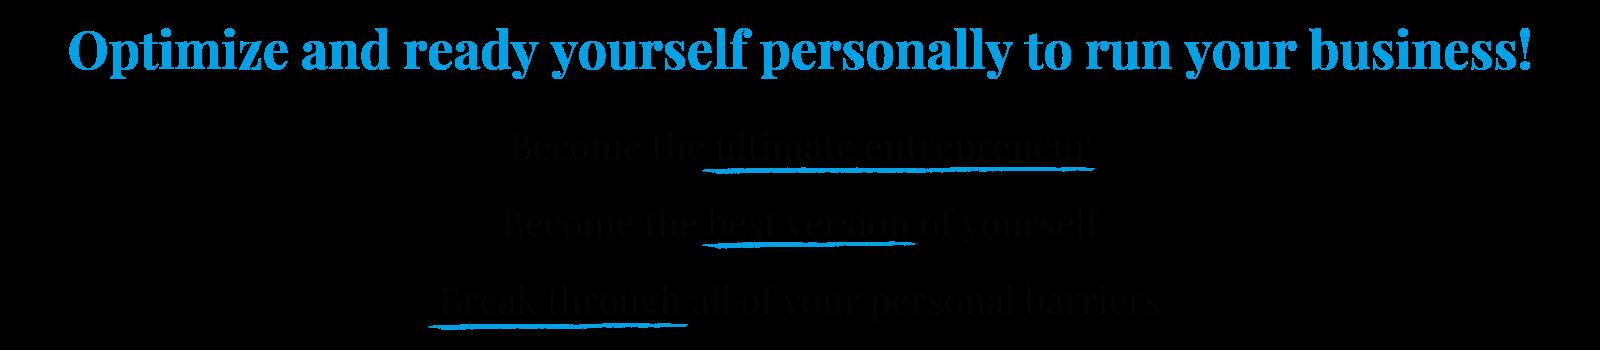 Personal_coaching_hero_image